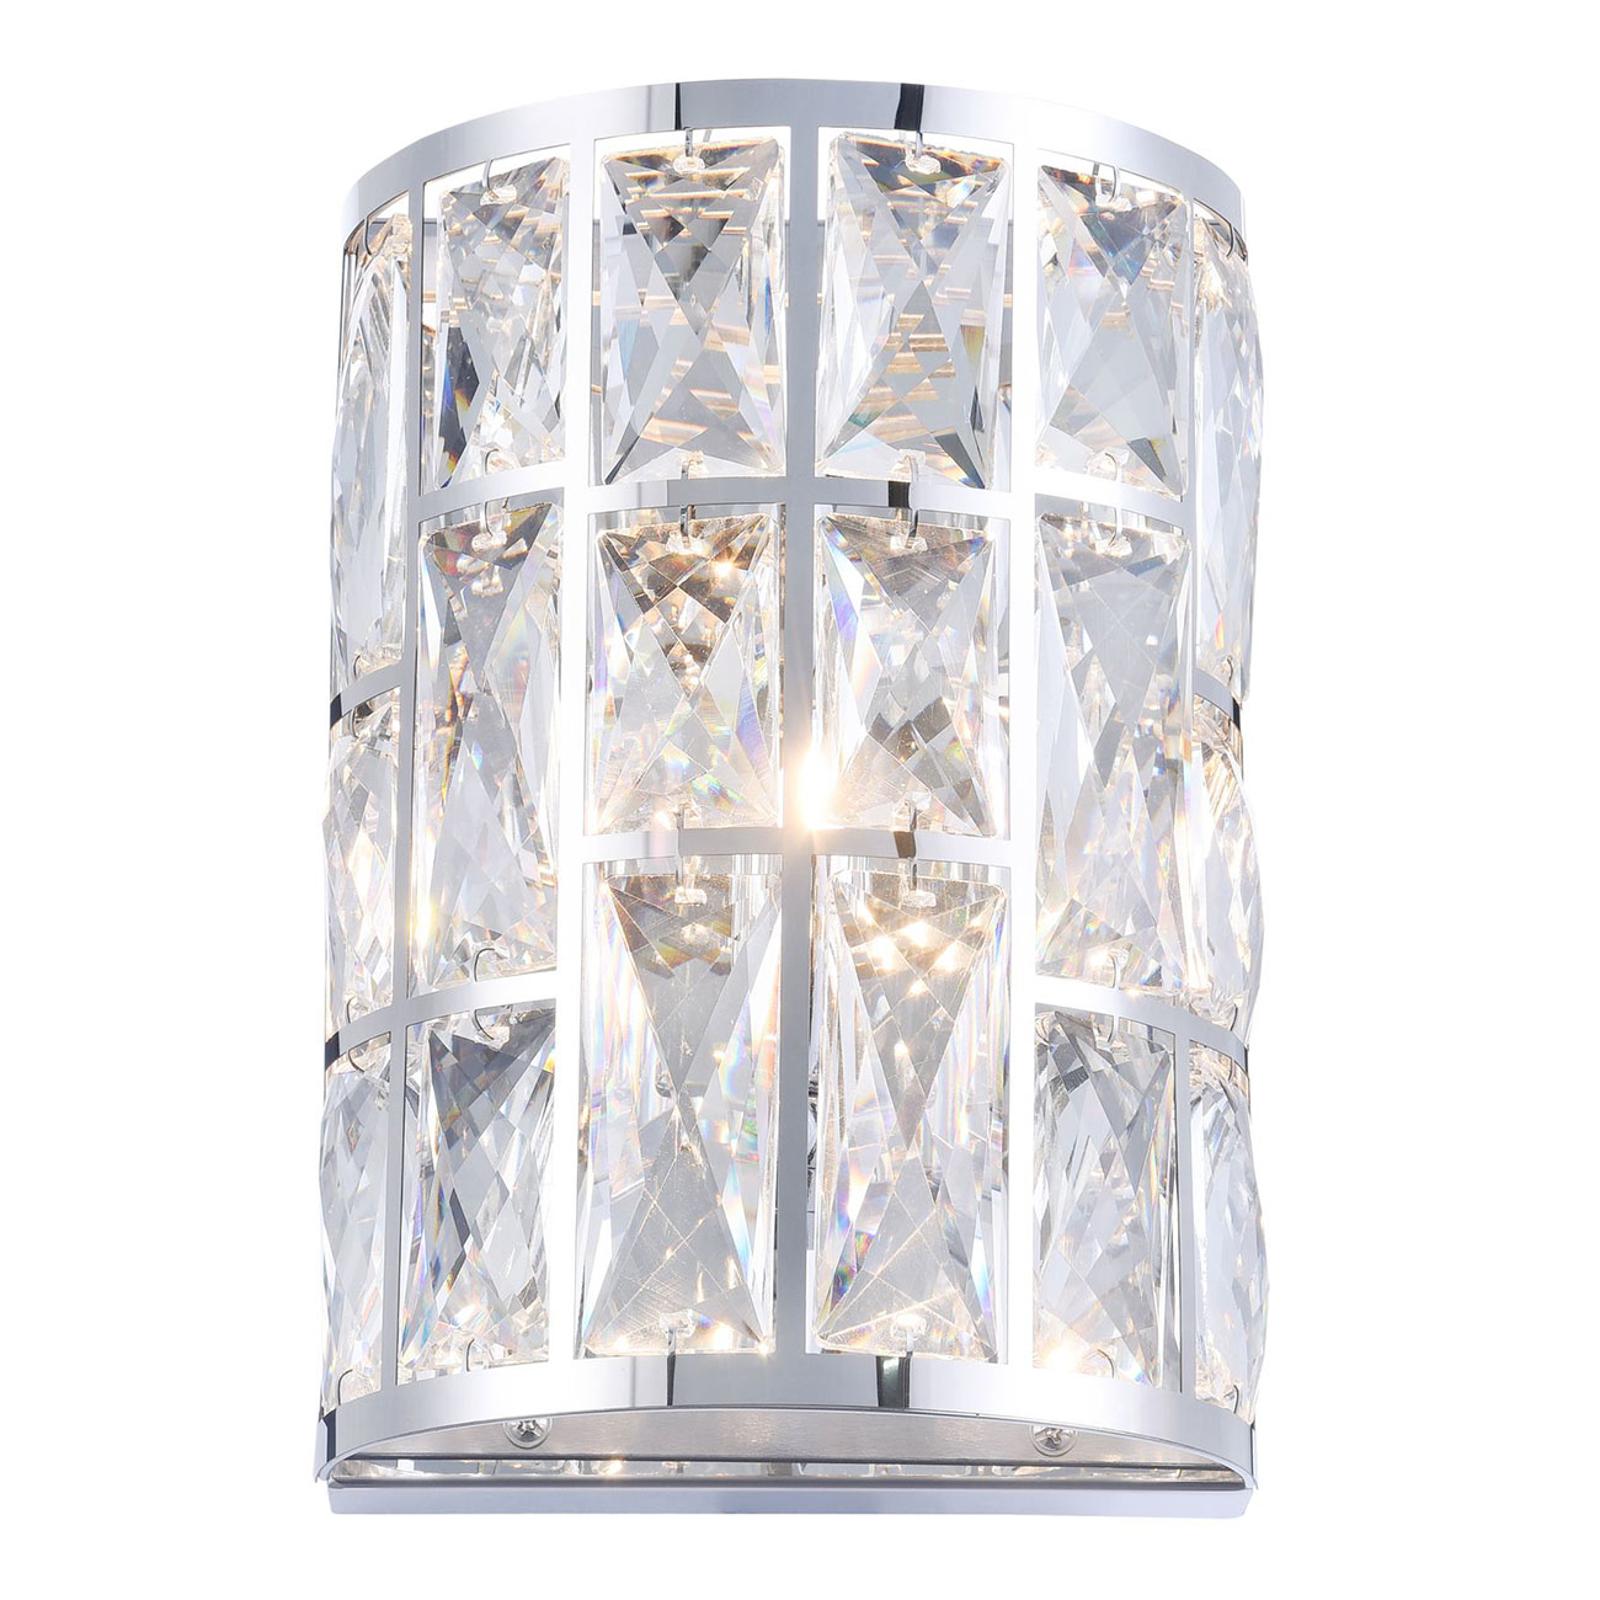 Wandlamp Gelid met kristalglas-ruiten